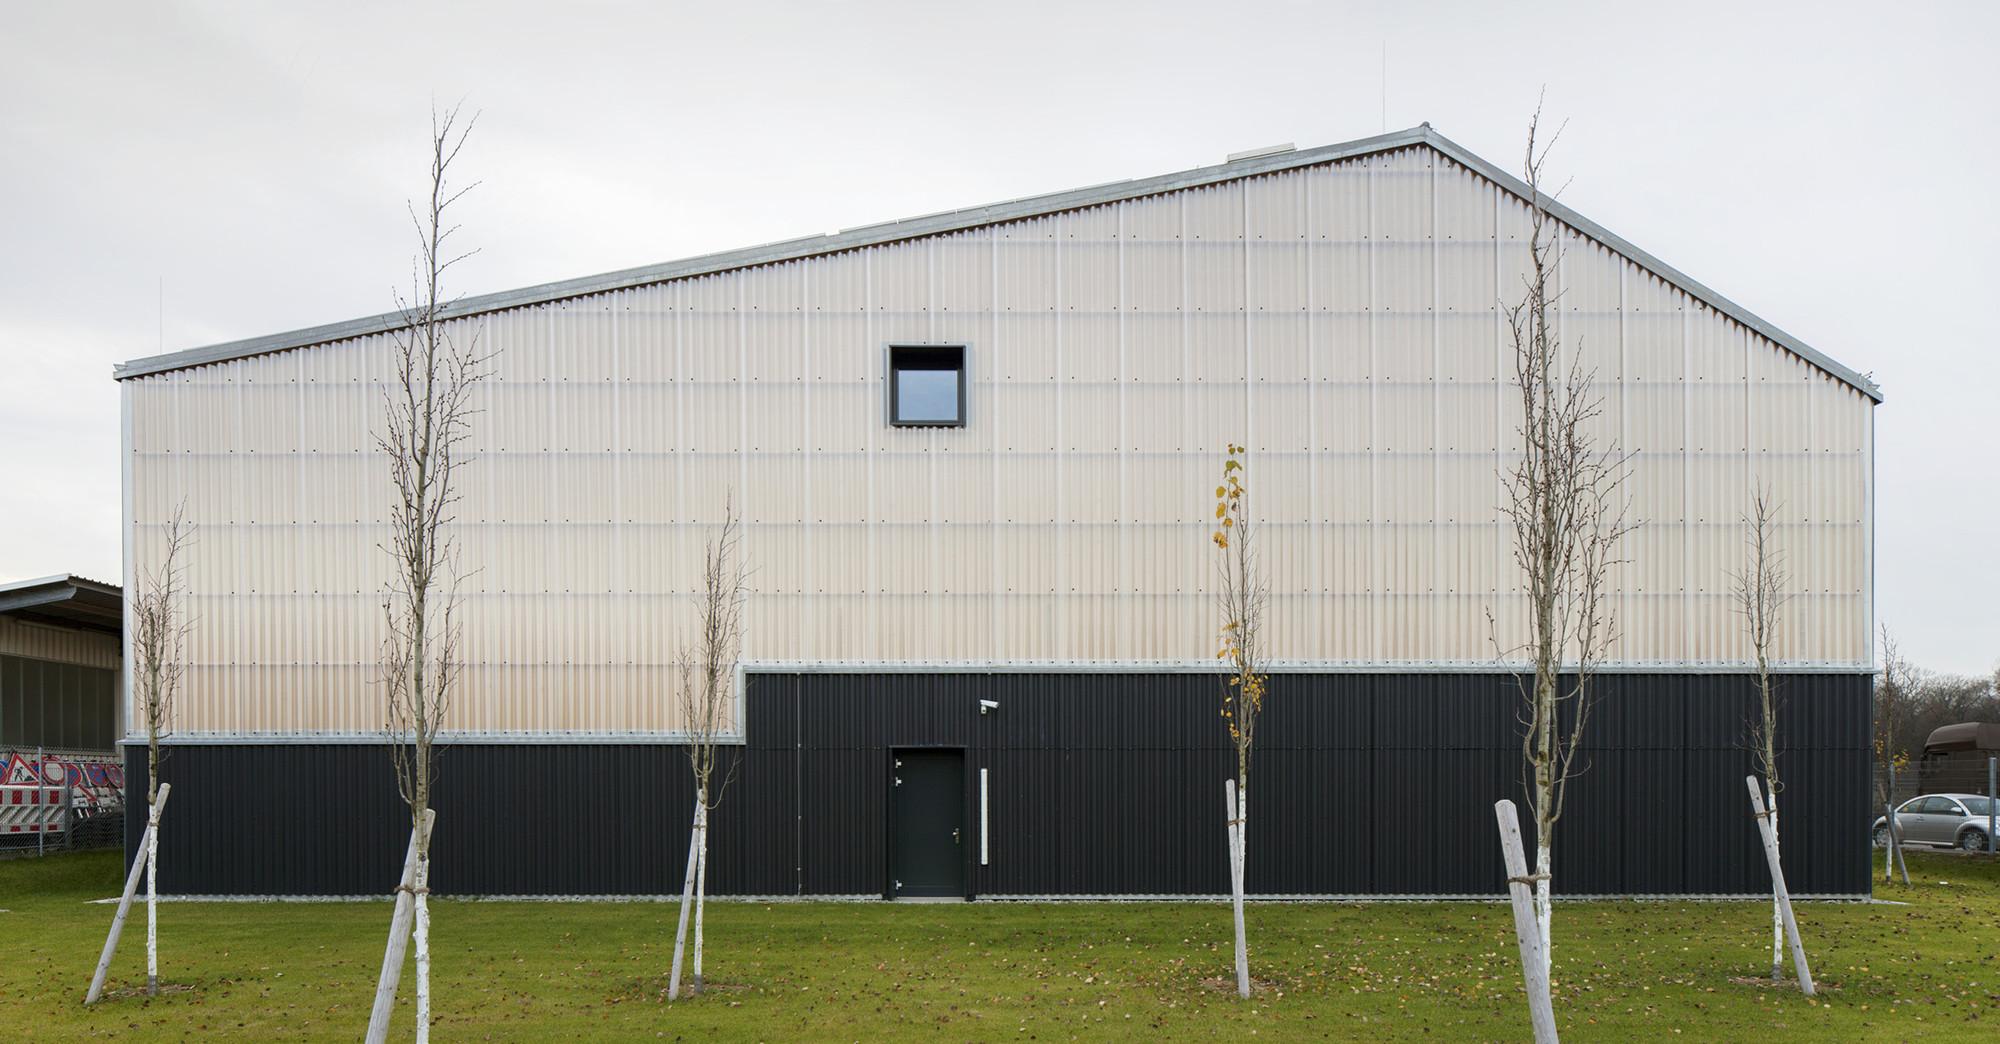 Central Art Depository Freiburg  / Pfeifer Kuhn Architekten, © Claudius Pfeifer